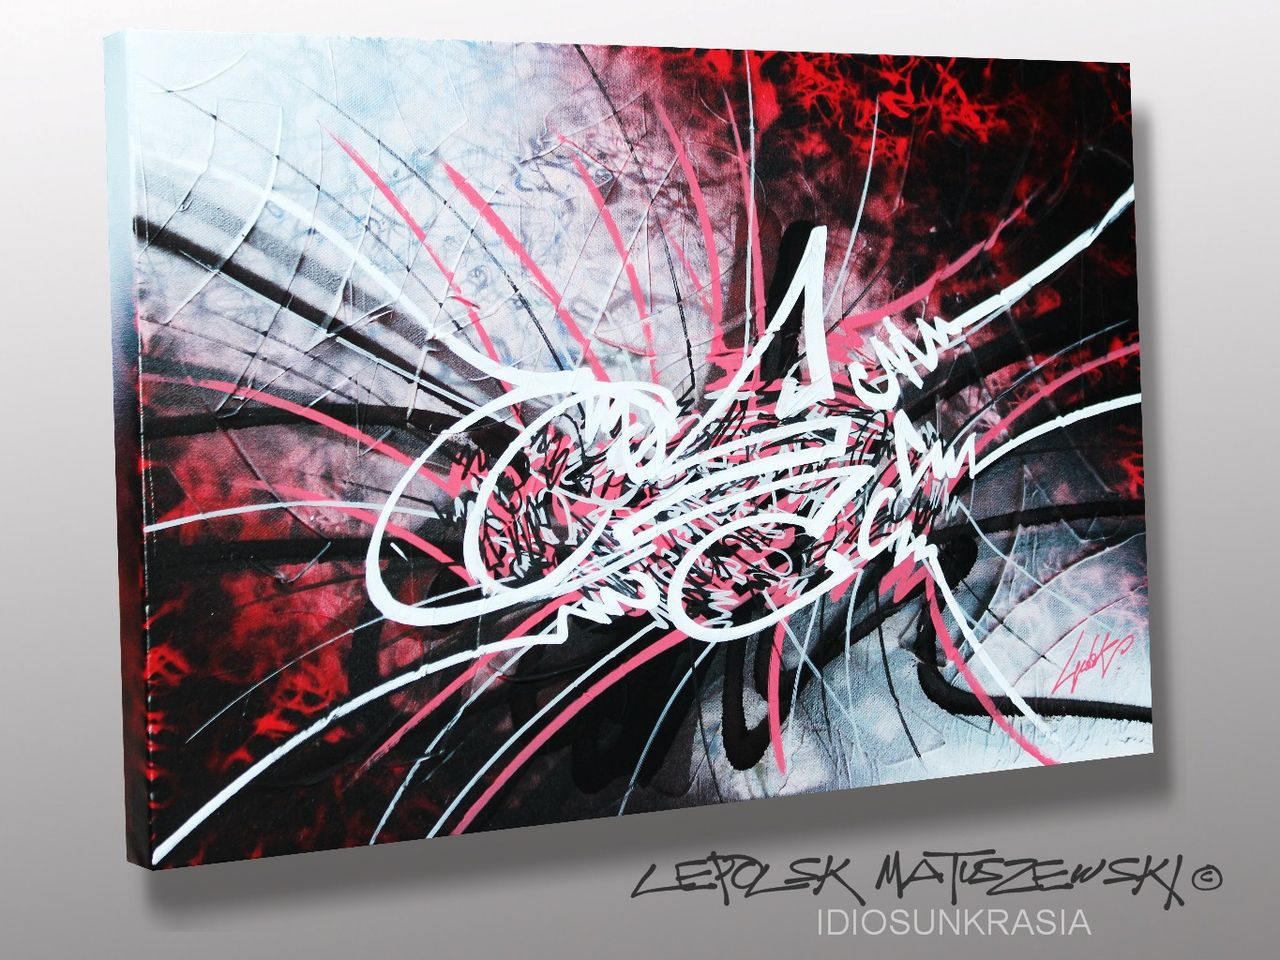 MK  Lepolsk Matuszewski IDIOSUNKRASIA   Calligraffiti abstraite